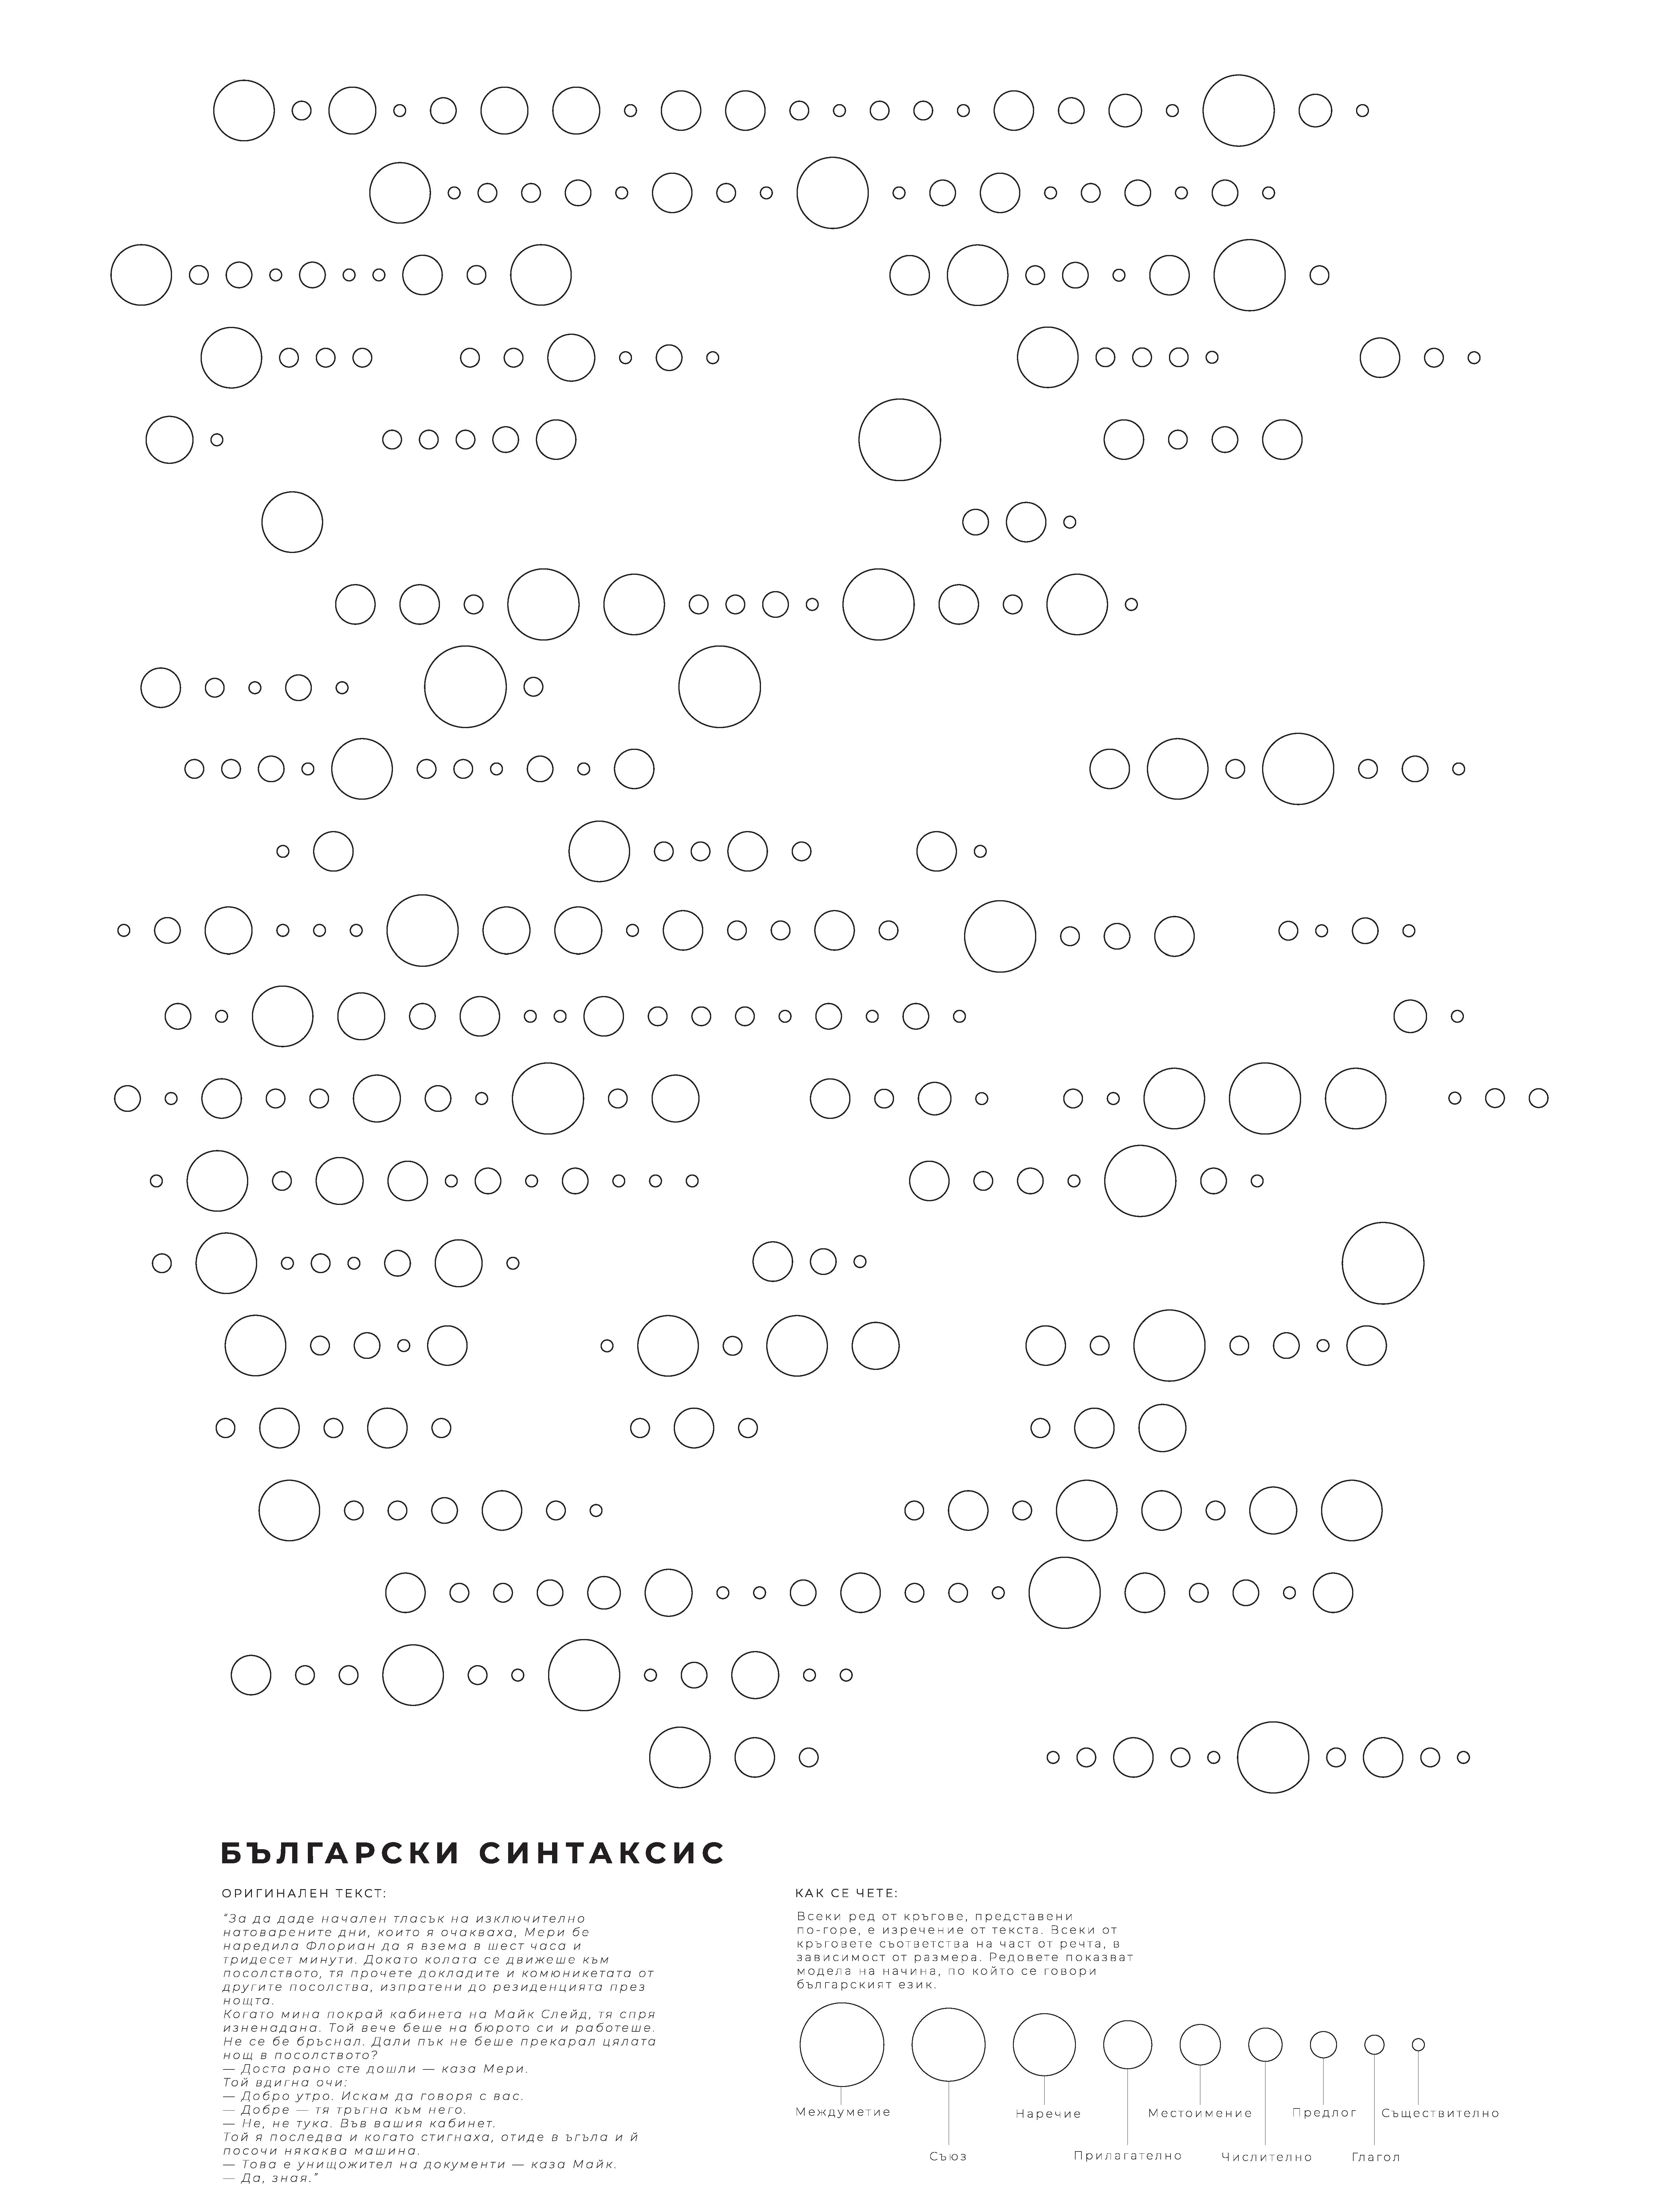 Bulgarian Syntax